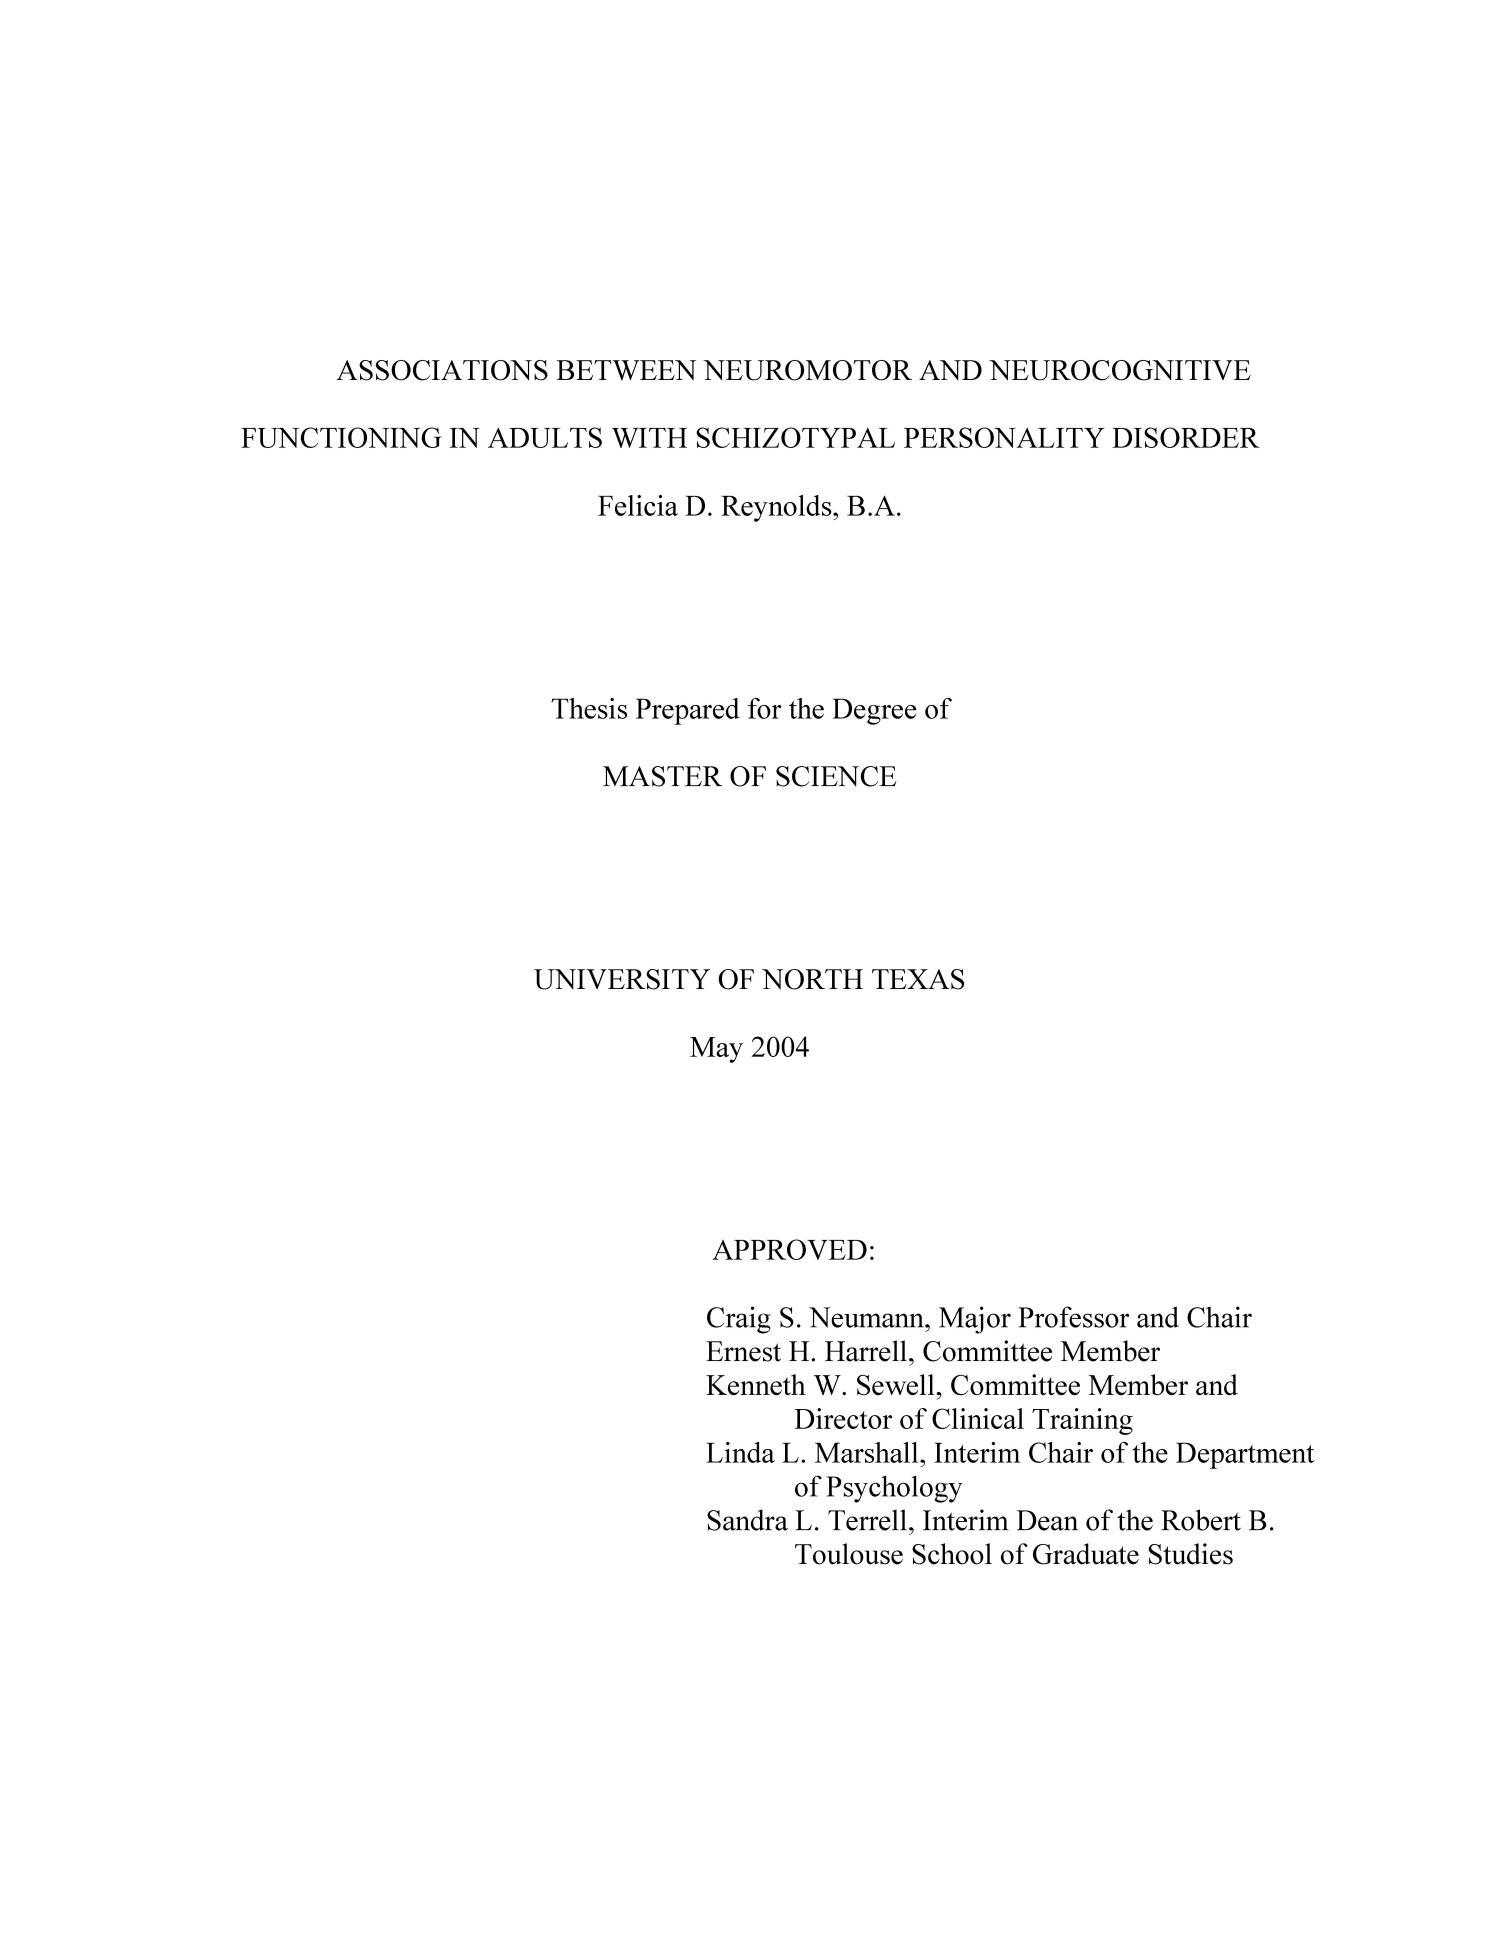 Associations Between Neuromotor and Neurocognitive